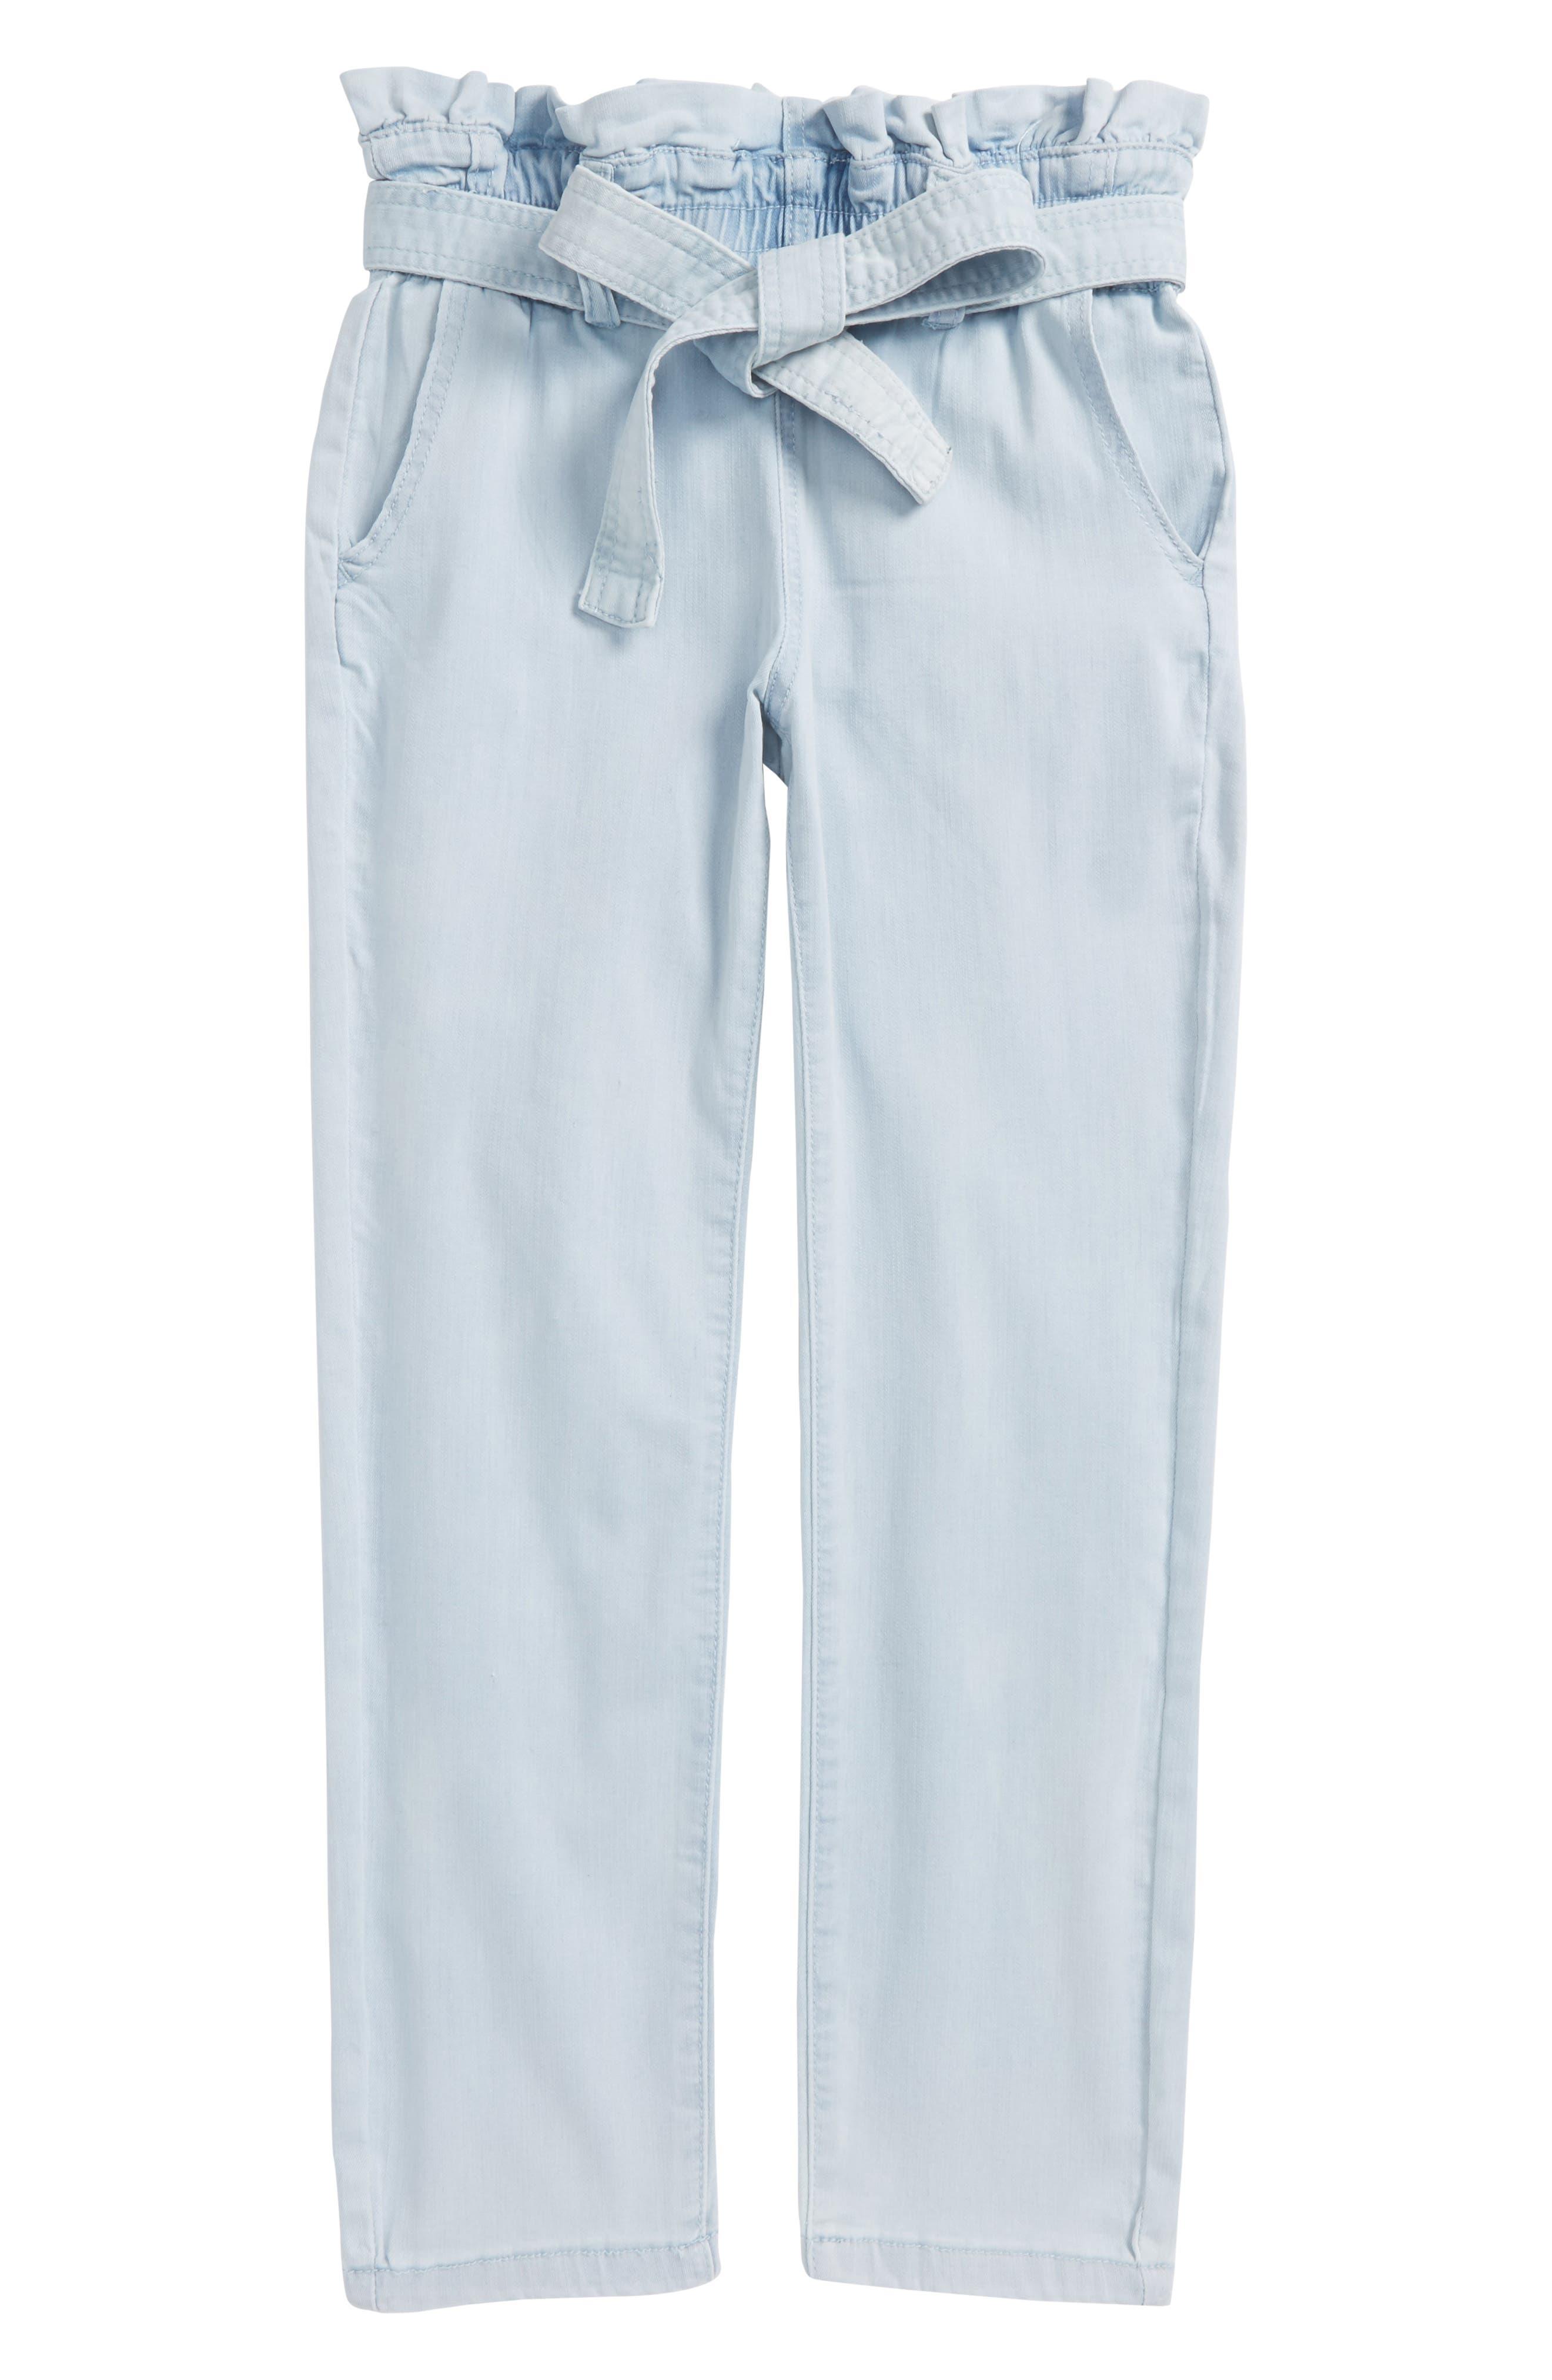 Main Image - ag adriano goldschmied kids Paper Bag Crop Pants (Big Girls)